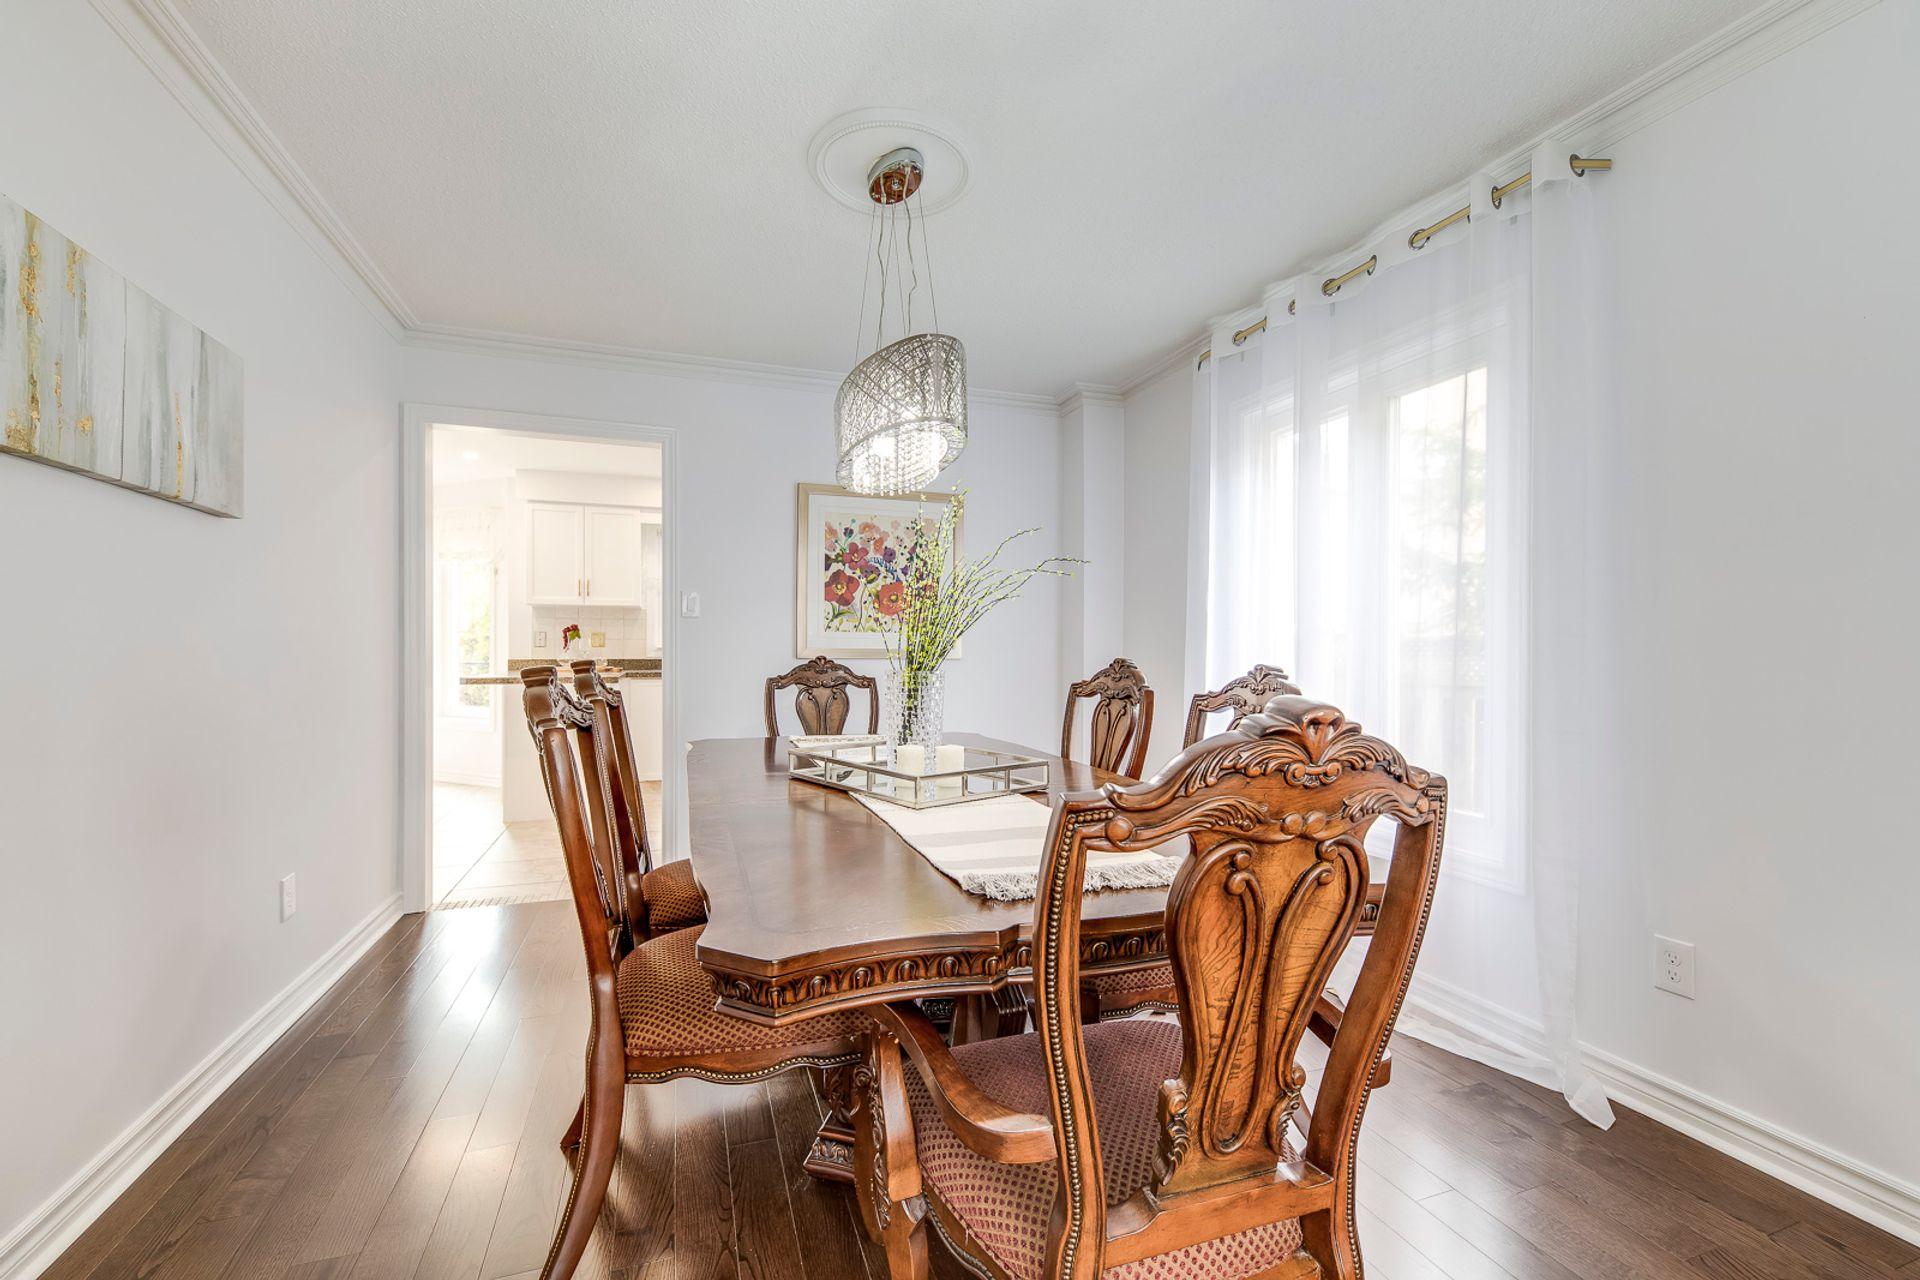 Dining Room - 2791 Mahogany Lane, Oakville - Elite3 & Team at 2791 Mahogany Lane, Clearview, Oakville